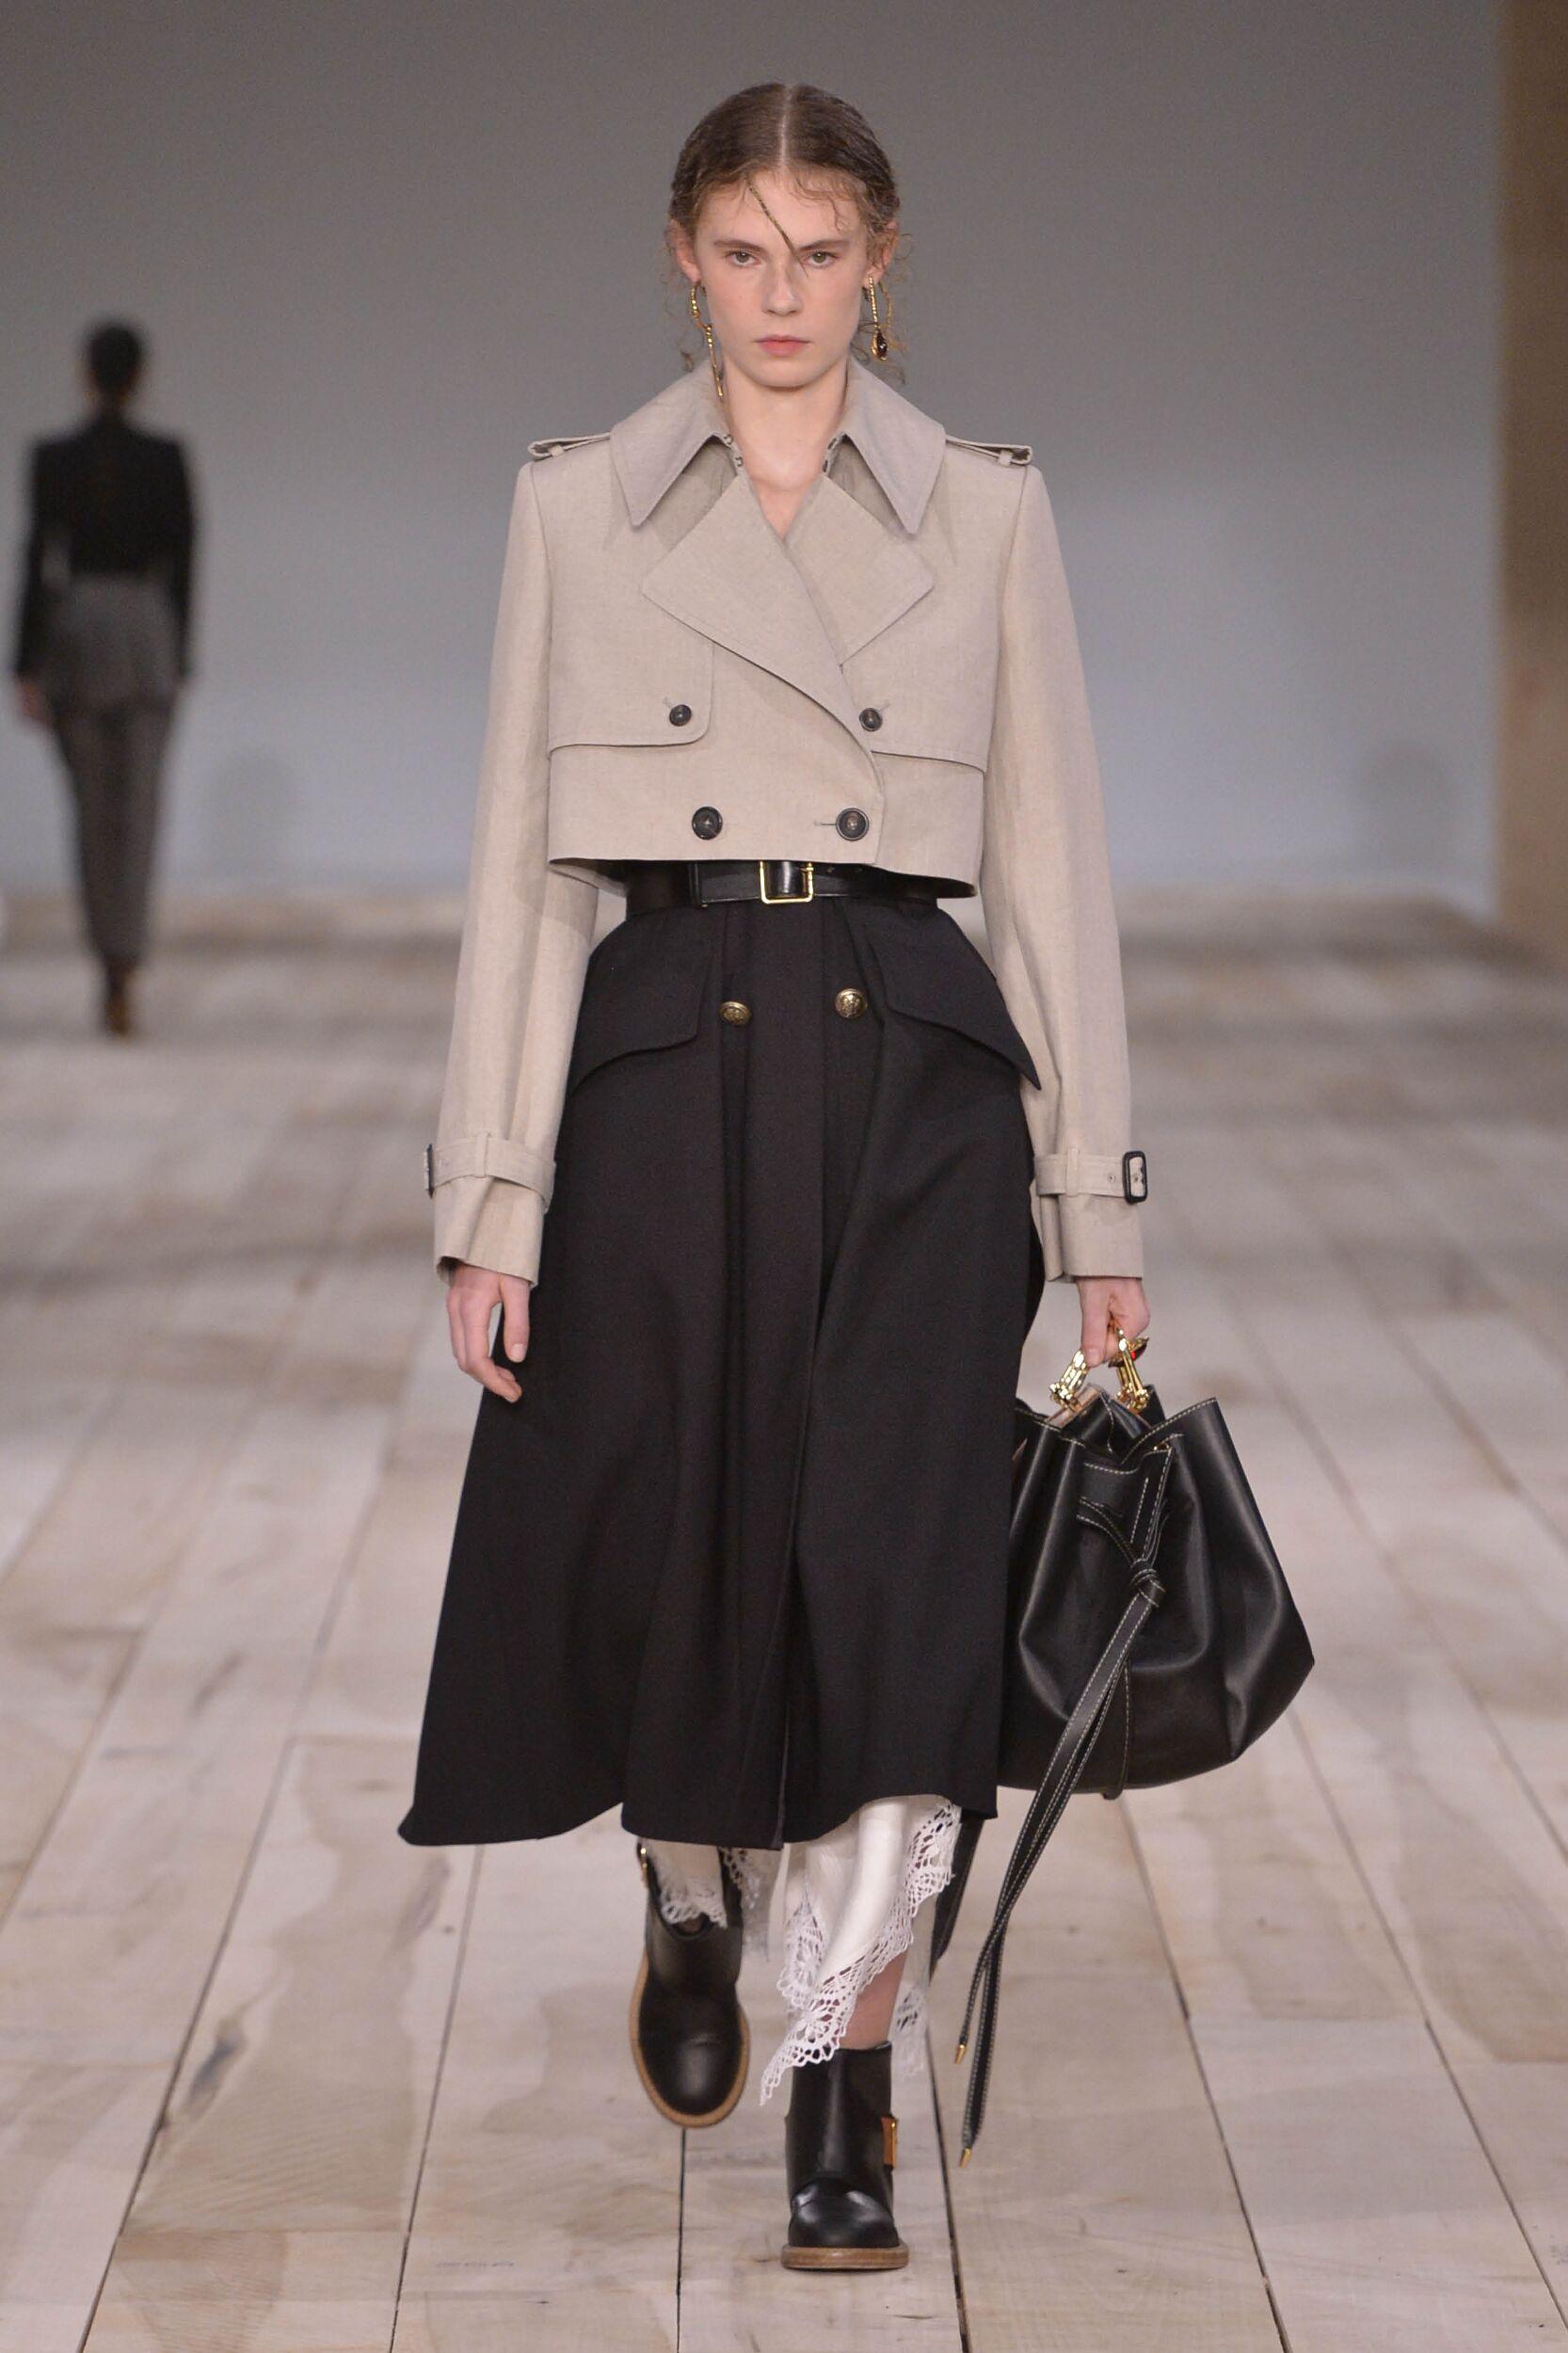 Alexander McQueen SS 2020 Womenswear